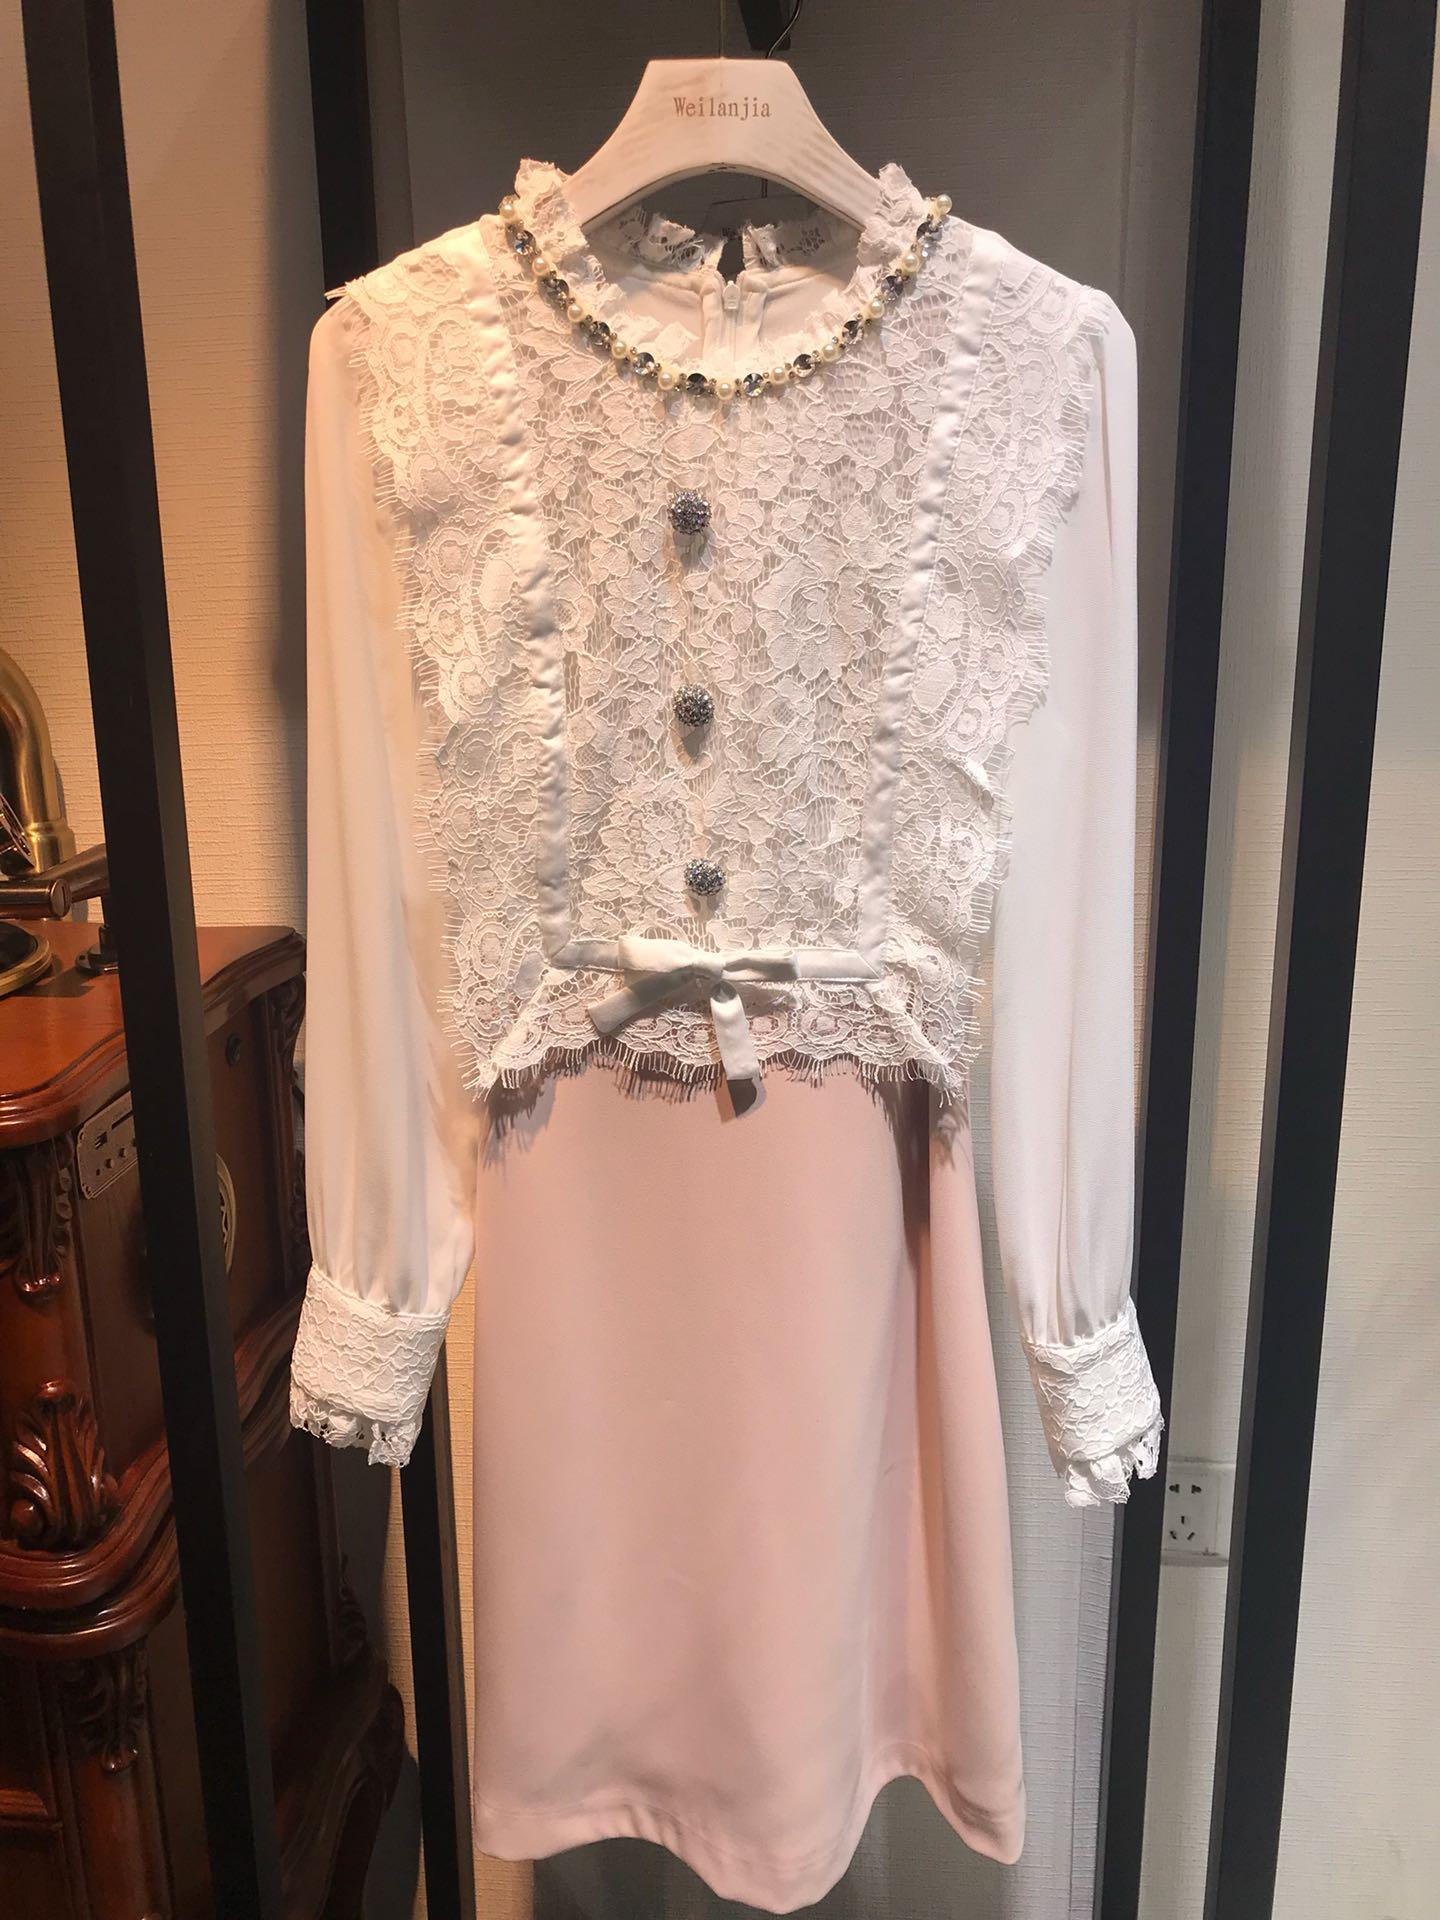 Designer 2020 Black/Pink/Yellow Solid Print Women's Dress Milan Runway Crew Neck Long Sleeves Embroidery Beads Holiday Long Dress 031507